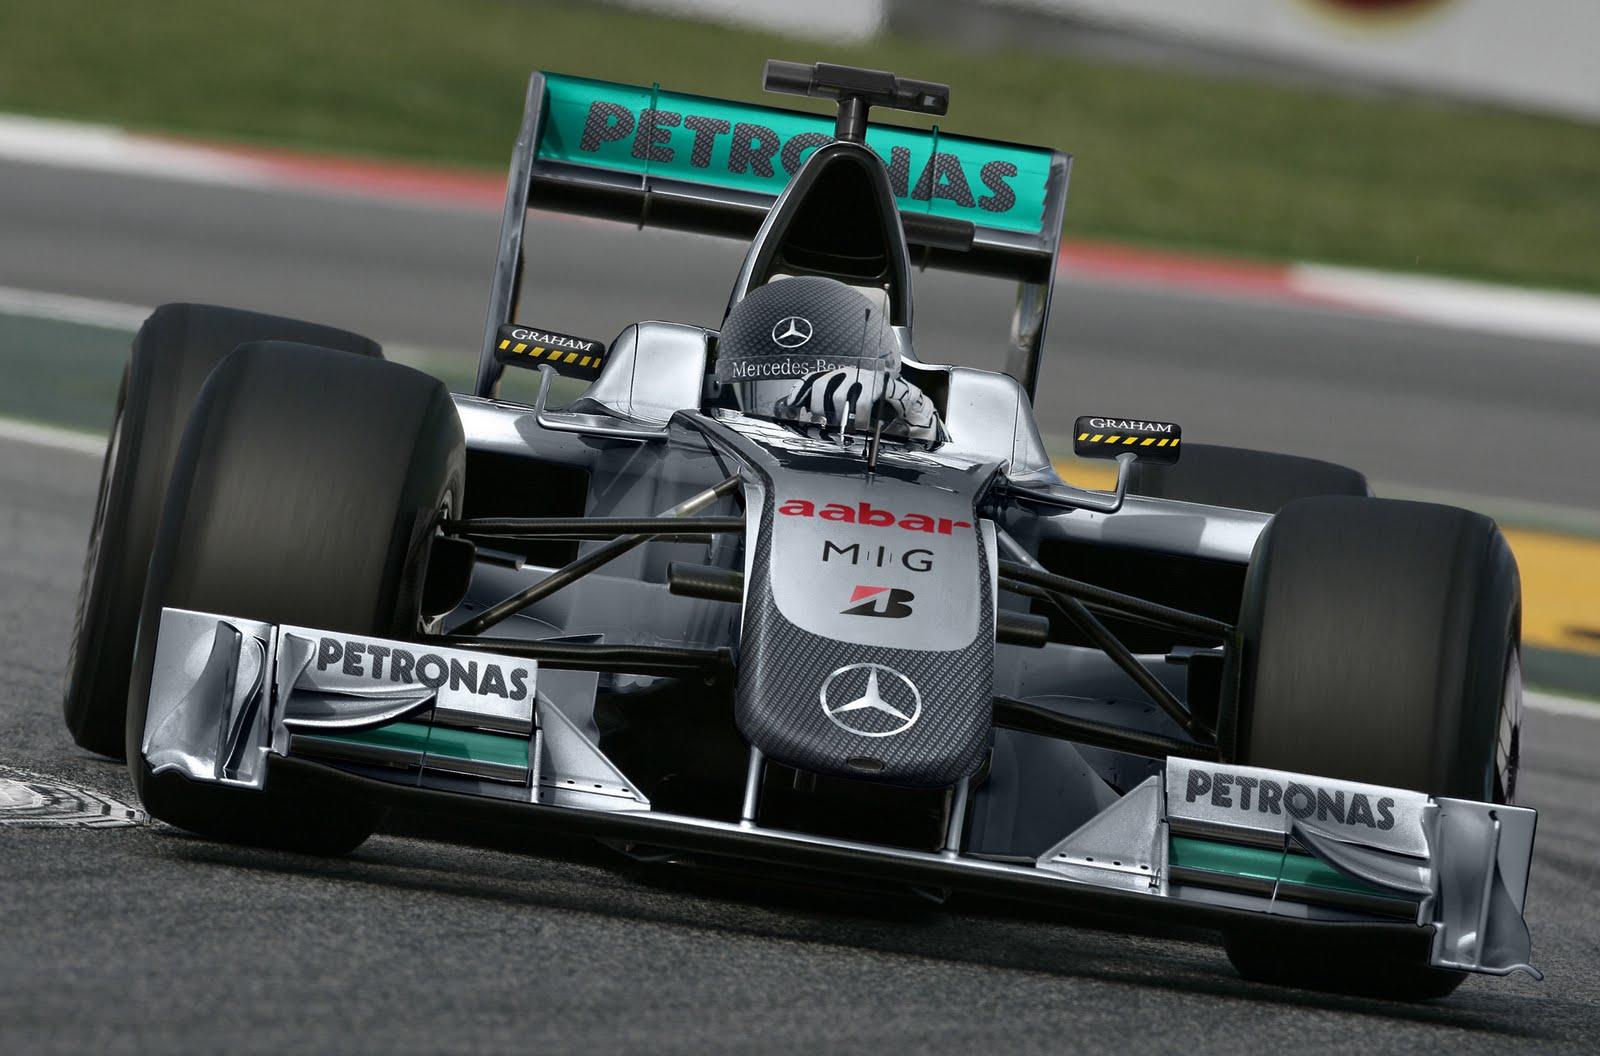 mercedes-formula1-petronas